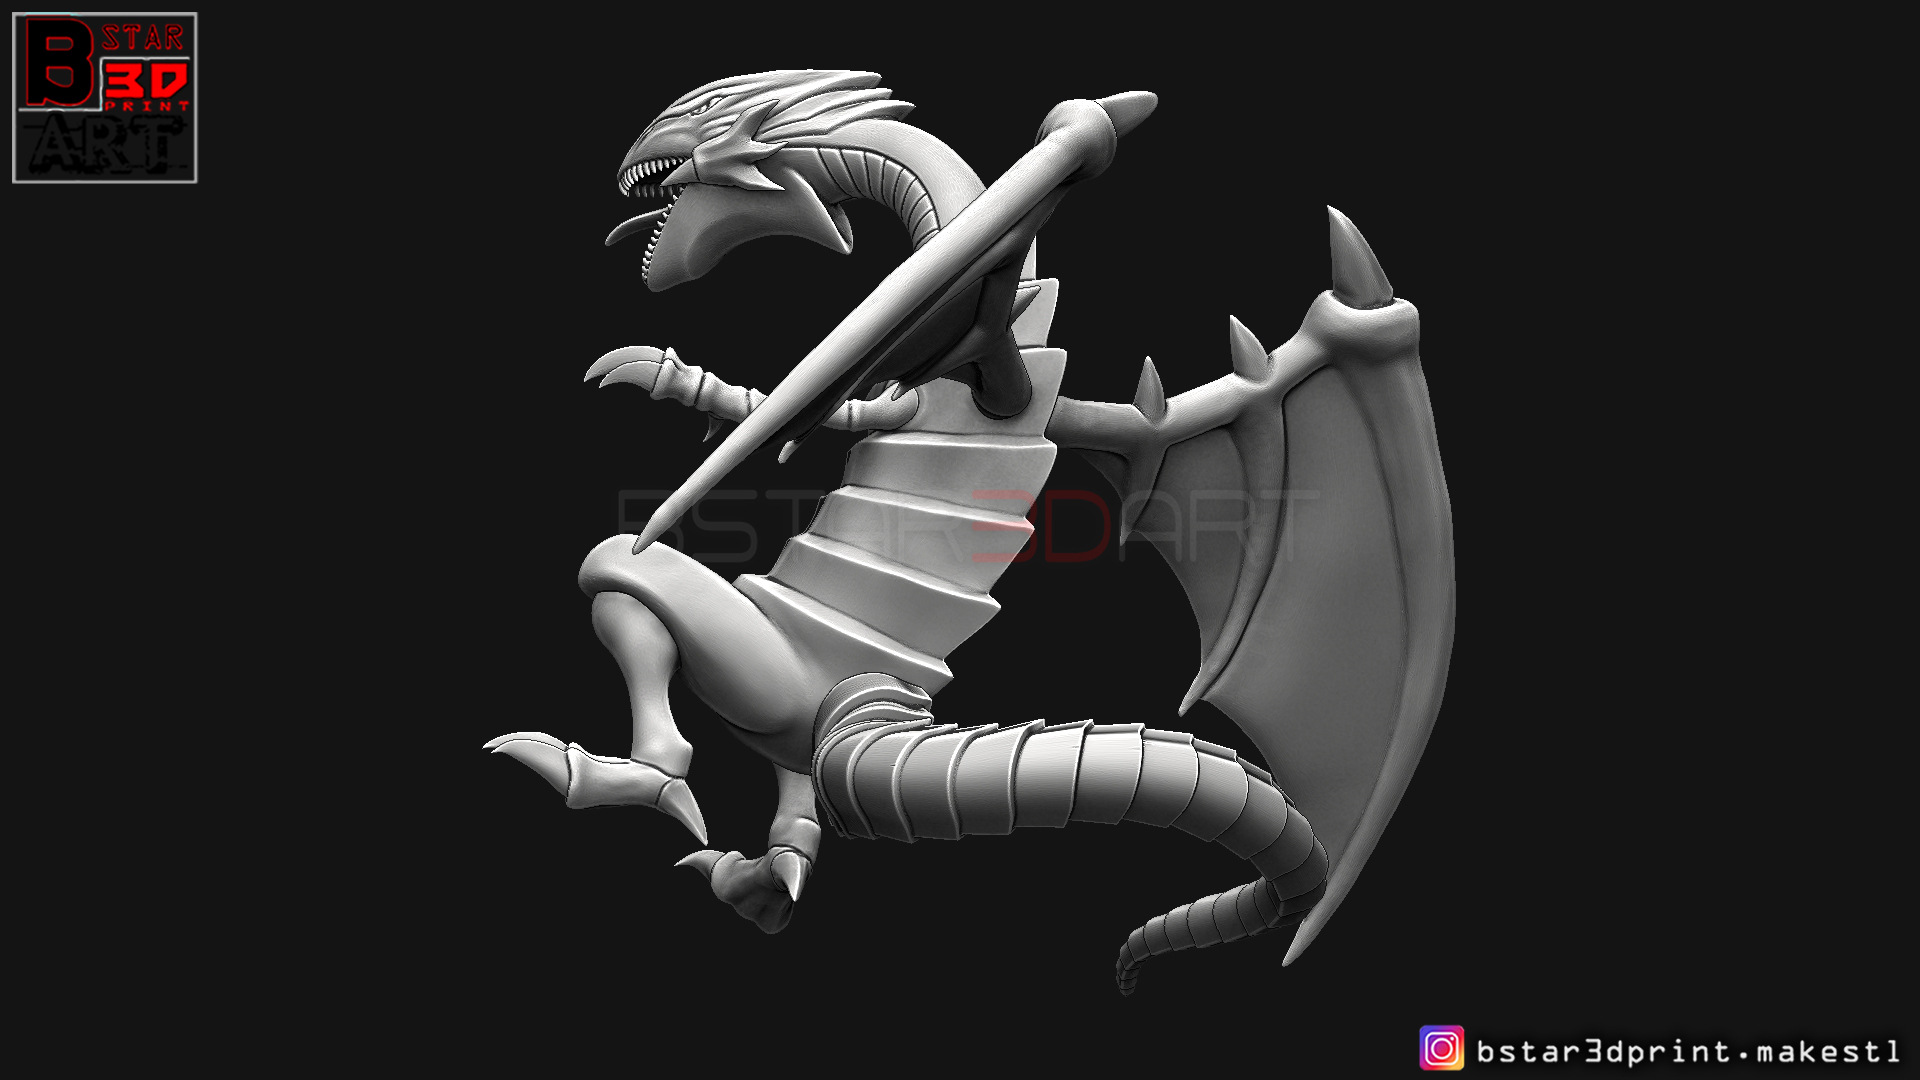 10.jpg Télécharger fichier STL yeux bleus dragon blanc - Yu Gi Oh • Modèle à imprimer en 3D, Bstar3Dart